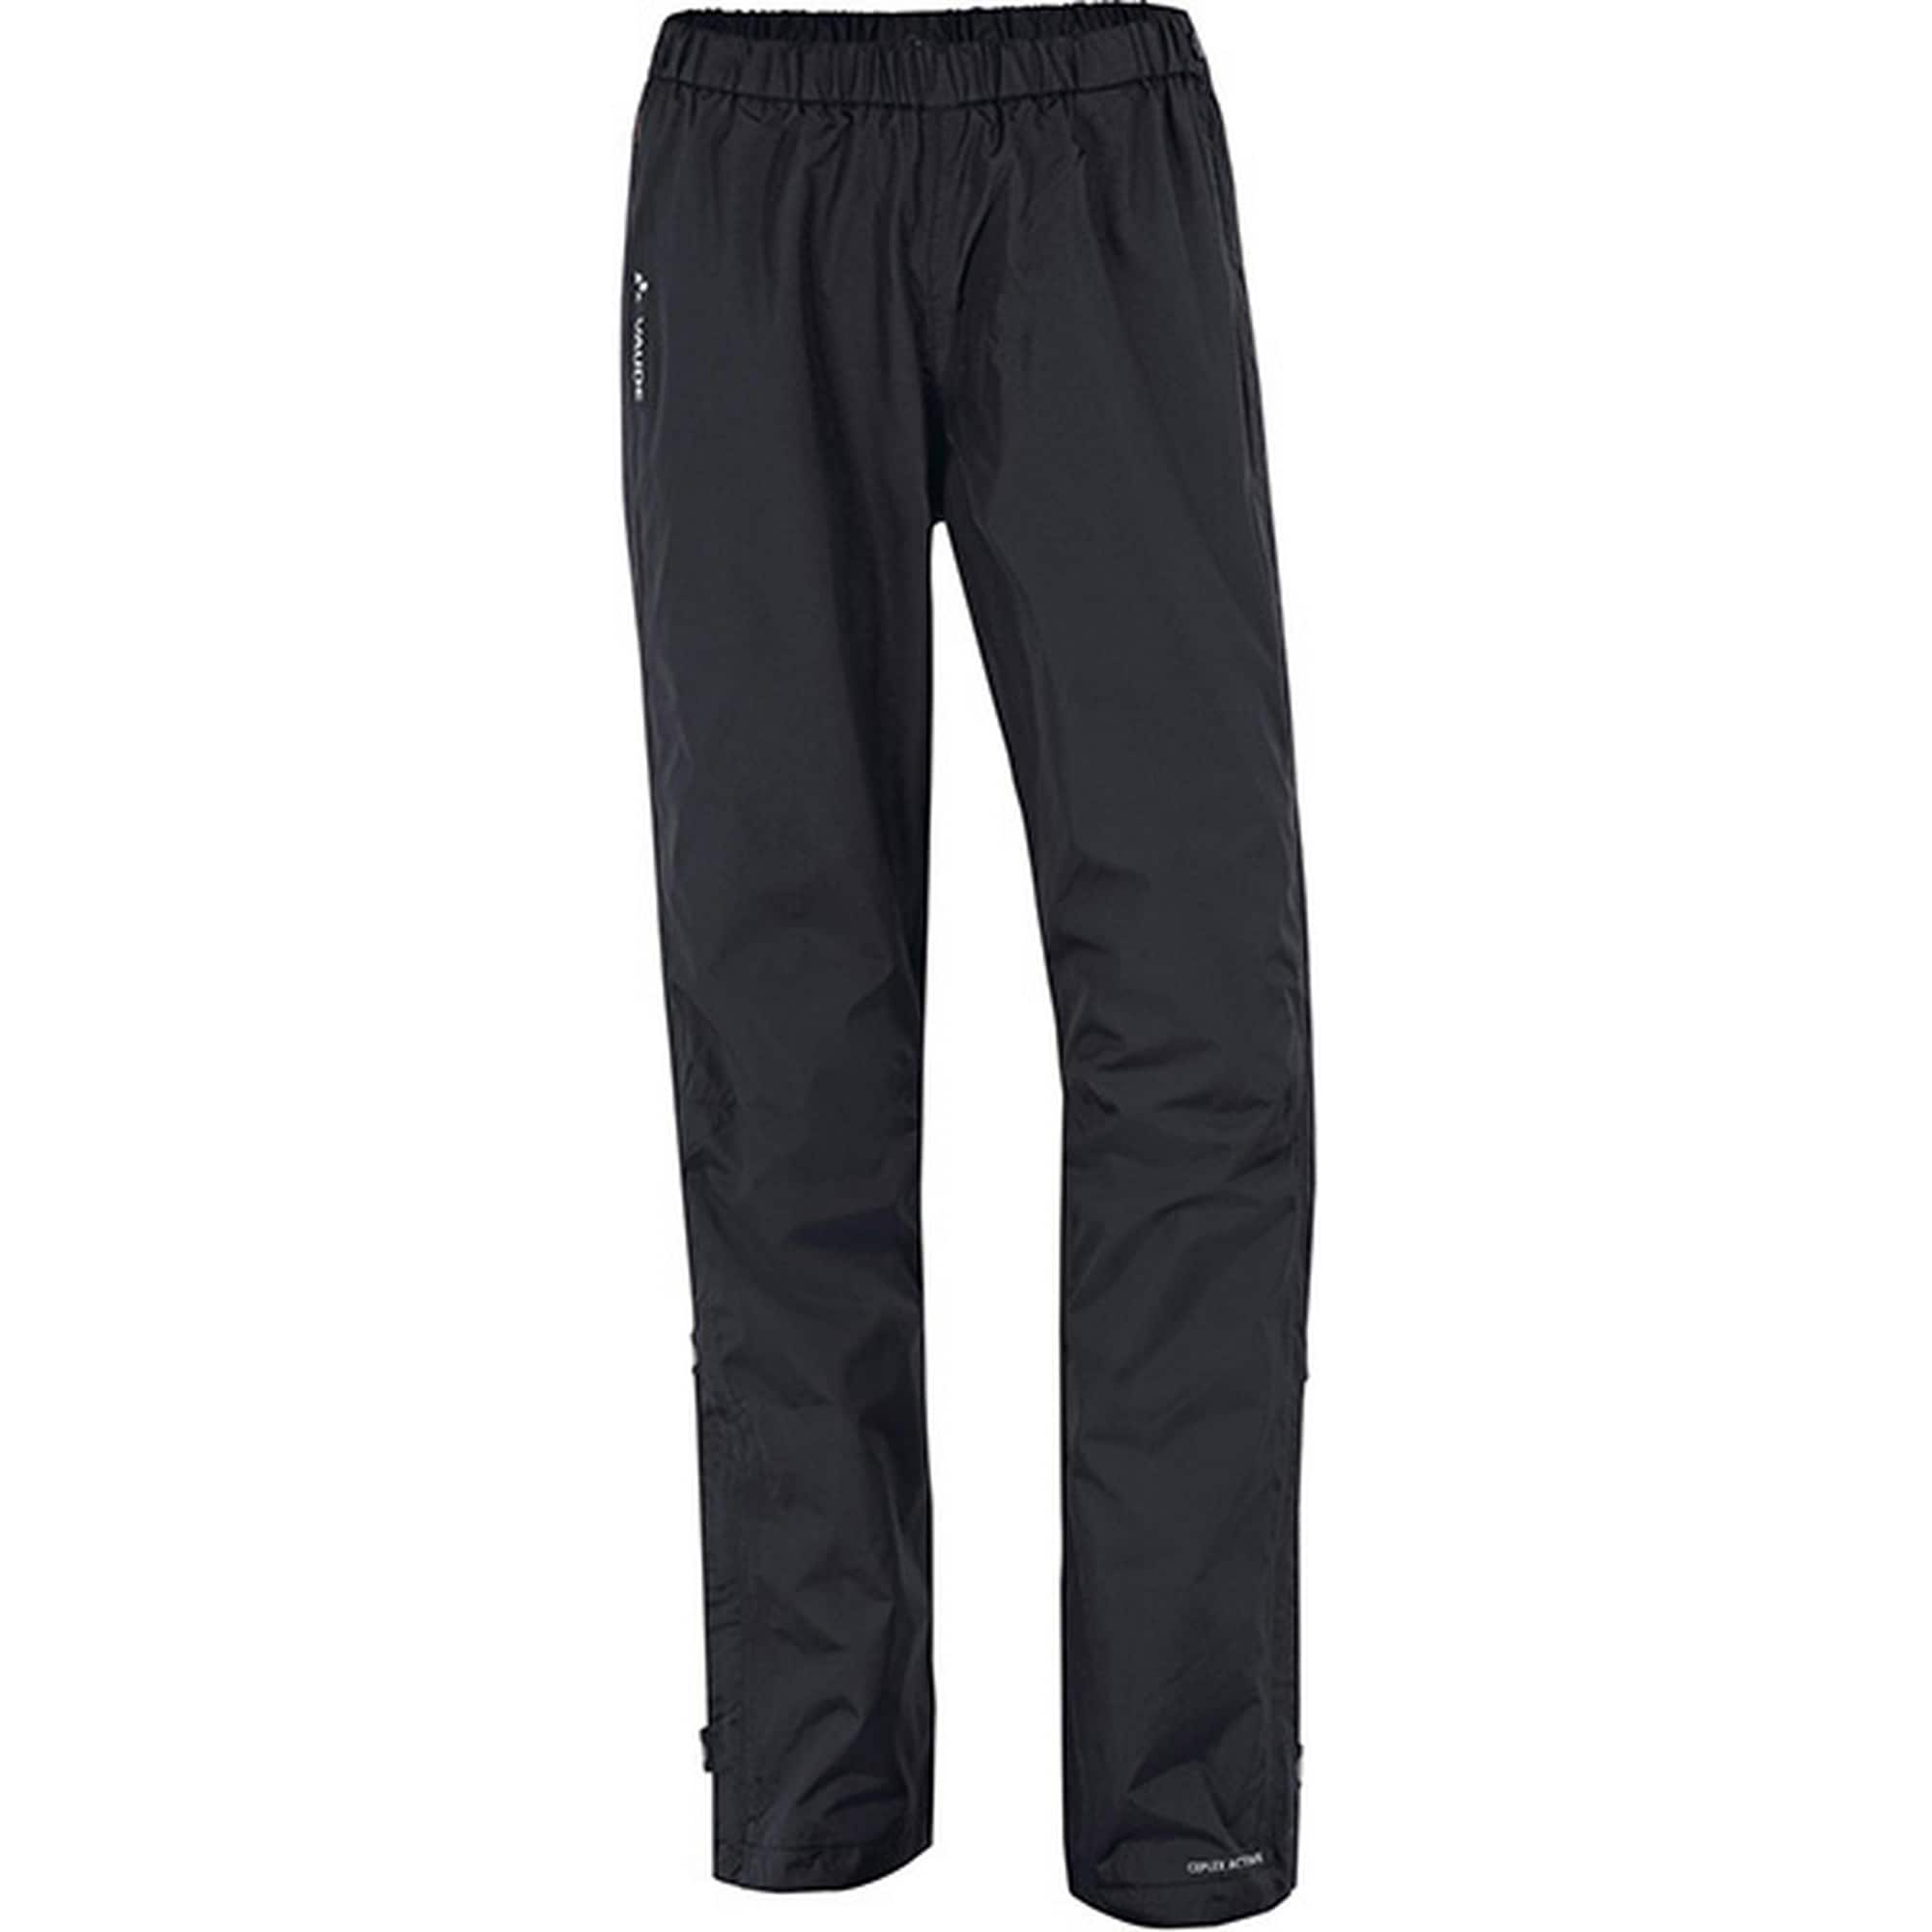 Regenhose 'Fluid Full-Zip' | Sportbekleidung > Sporthosen > Regenhosen | Vaude